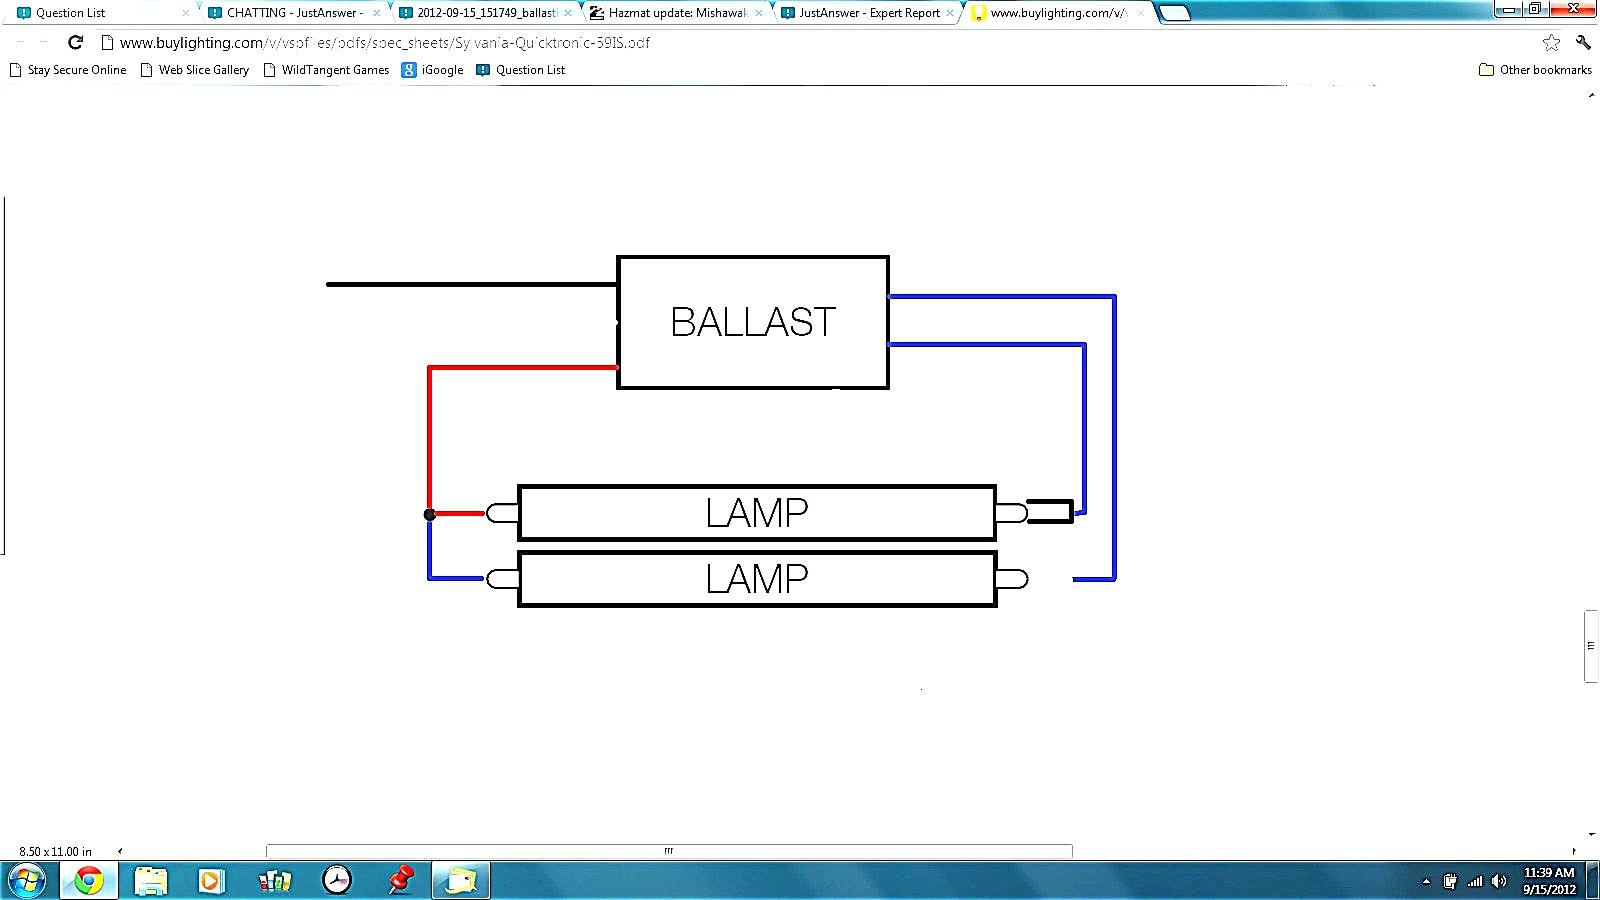 sylvania t8 ballast wiring diagram leviton three way dimmer switch quicktronic sample